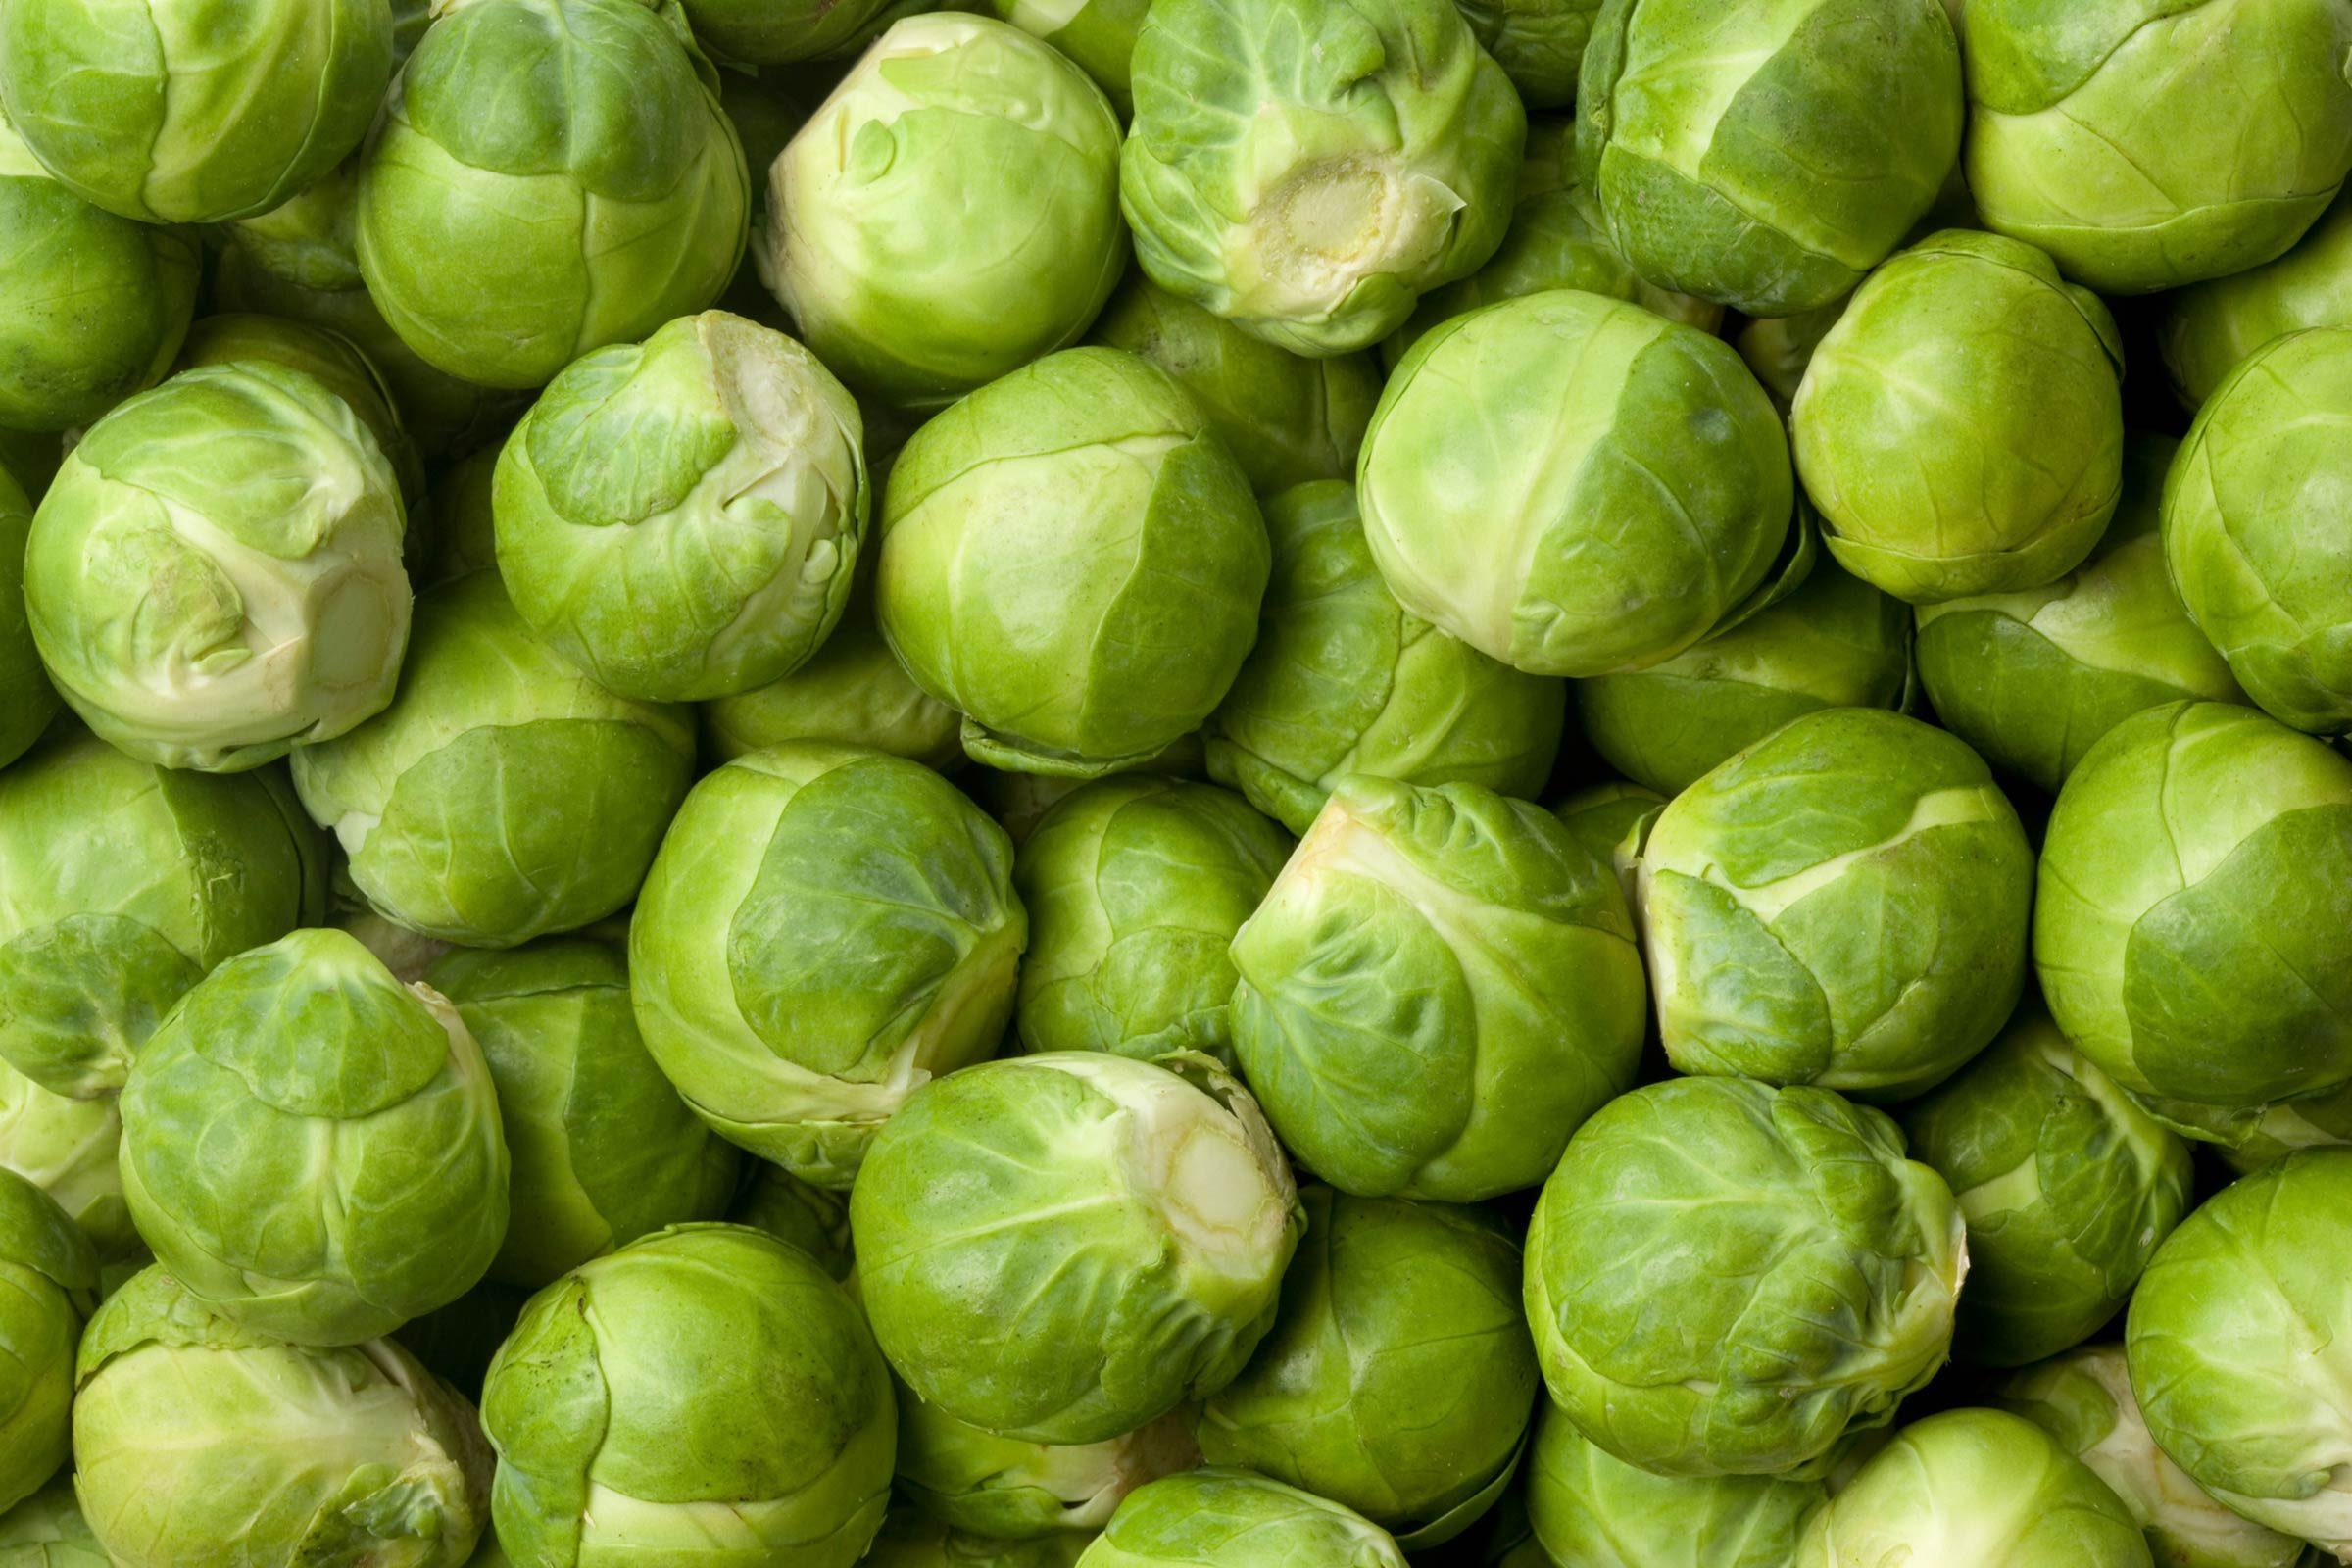 01_Sprouts_Surprising_Health_benefits_Gardening_